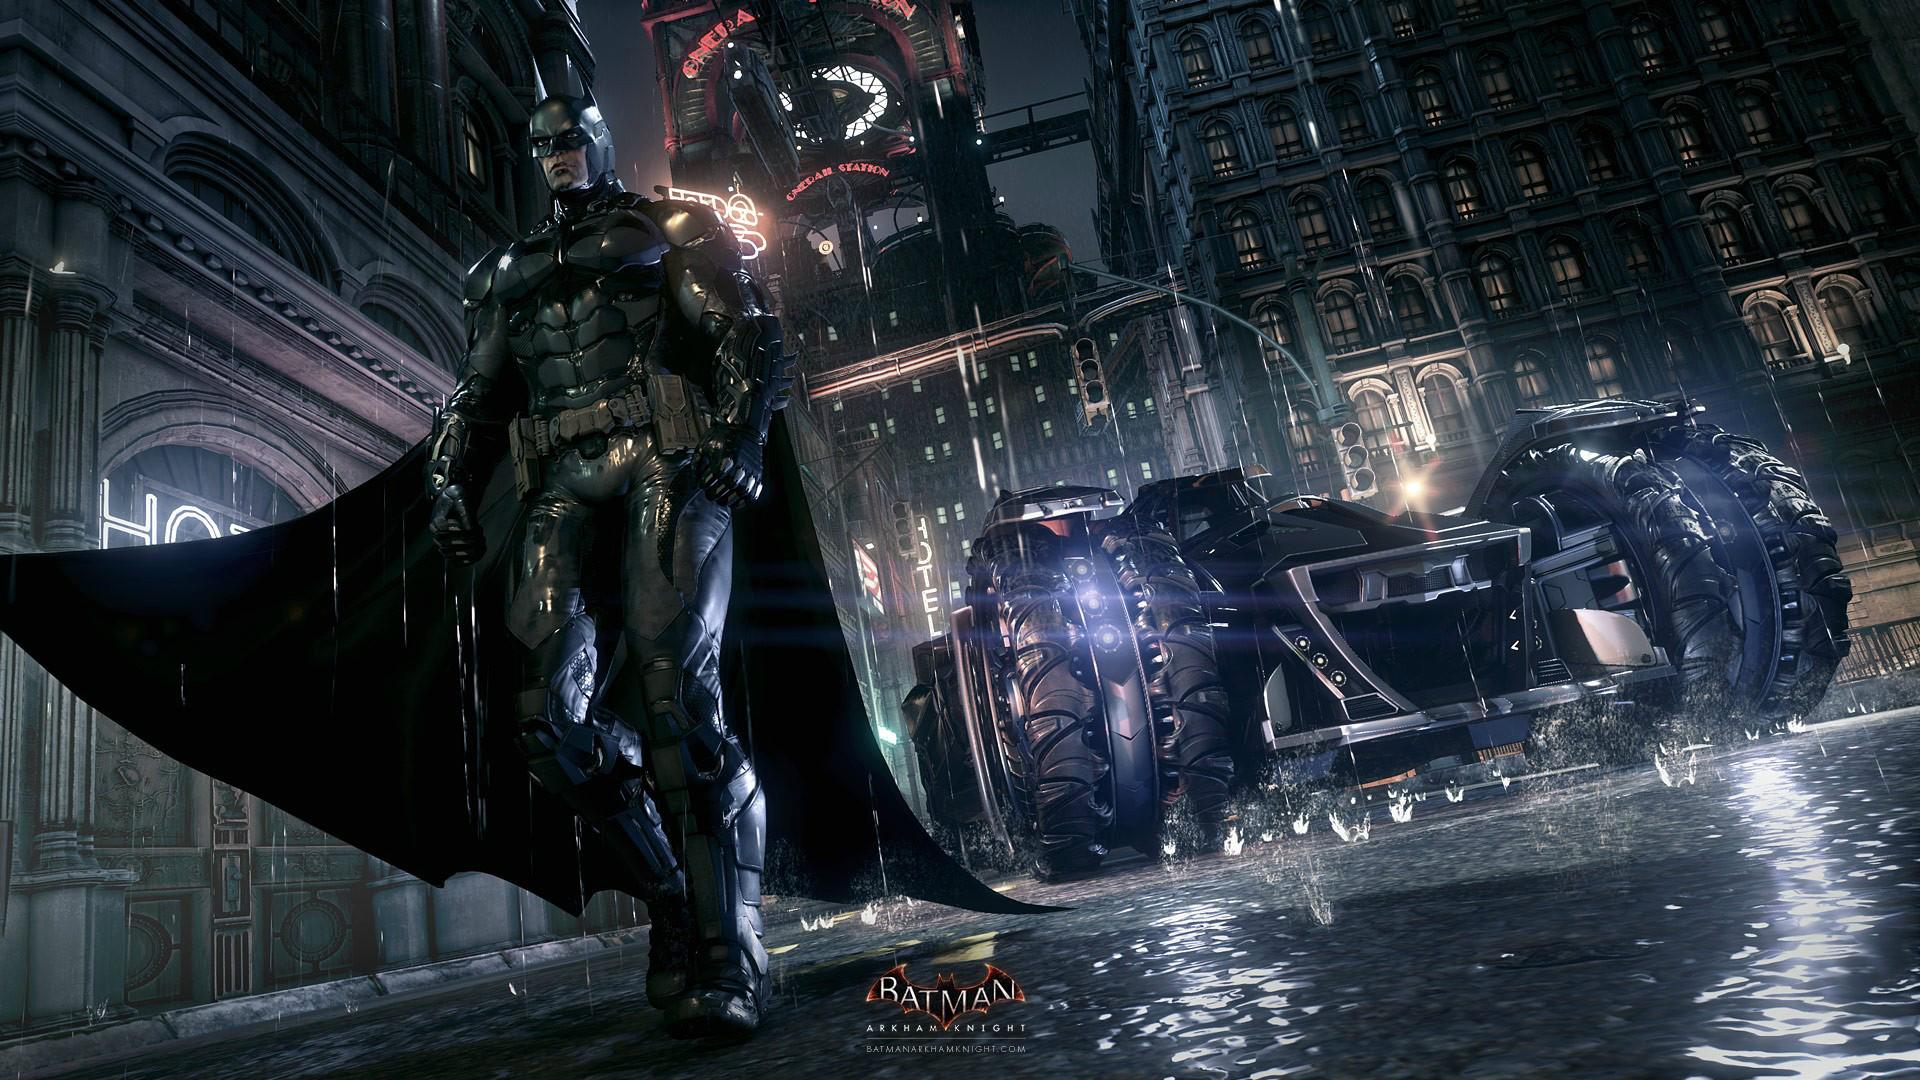 new batmobile batman arkham knight game hd 1920x1080 1080p wallpaper ...